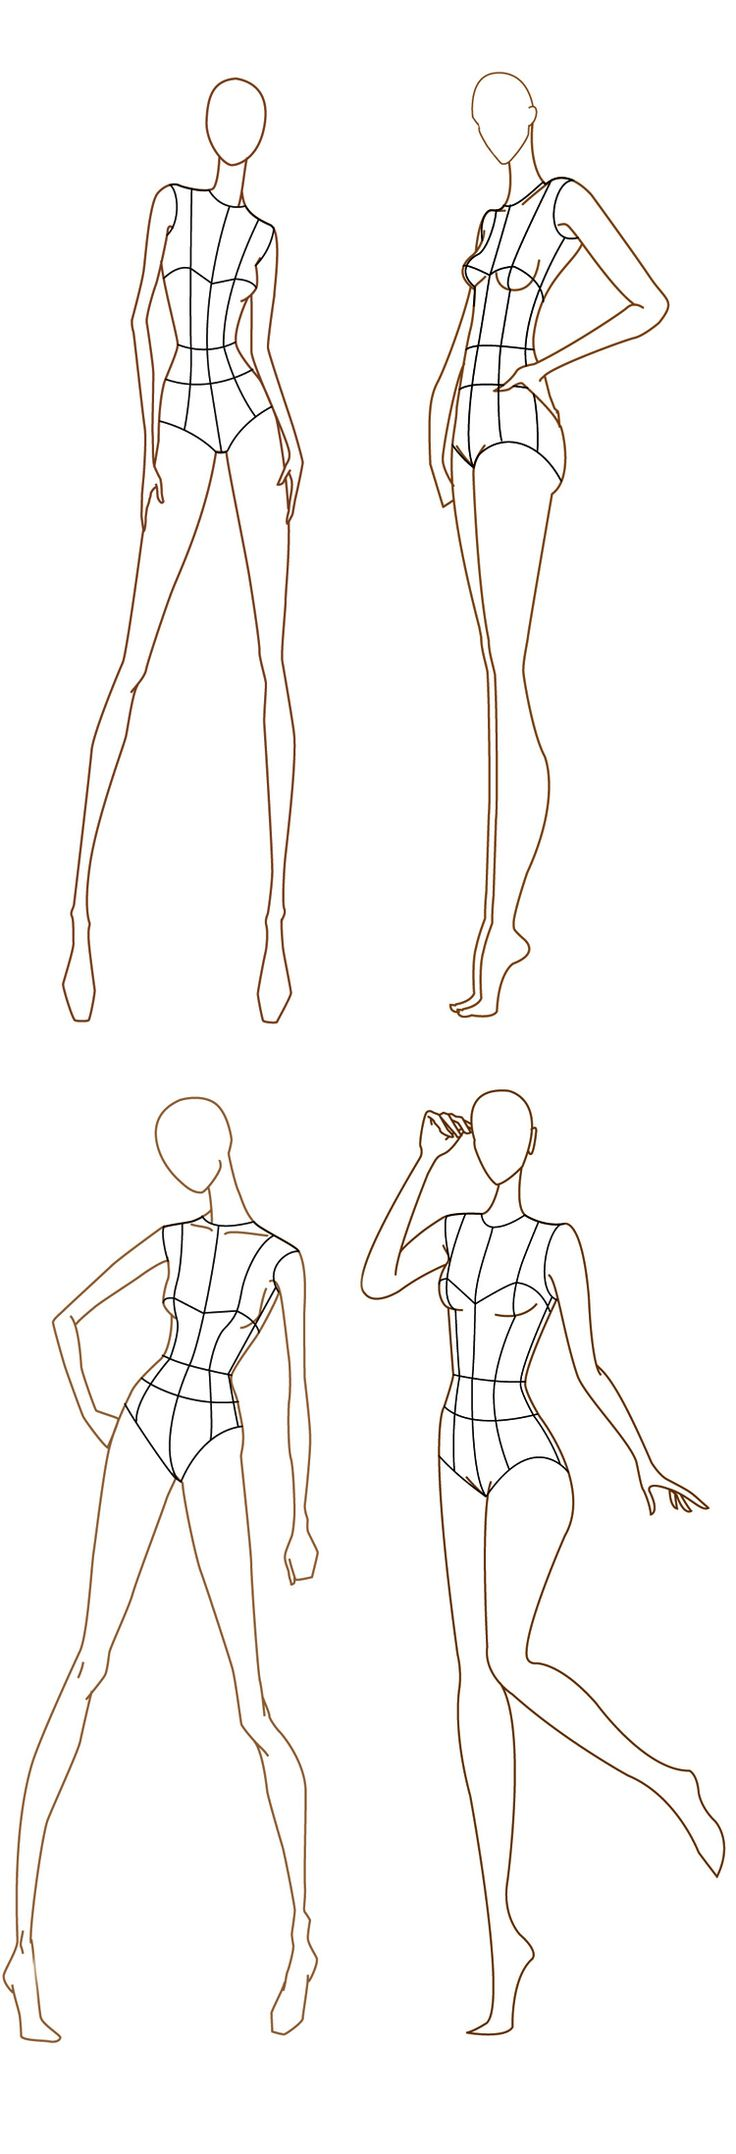 Drawn figurine active Figurine Pinterest illustration template illustration